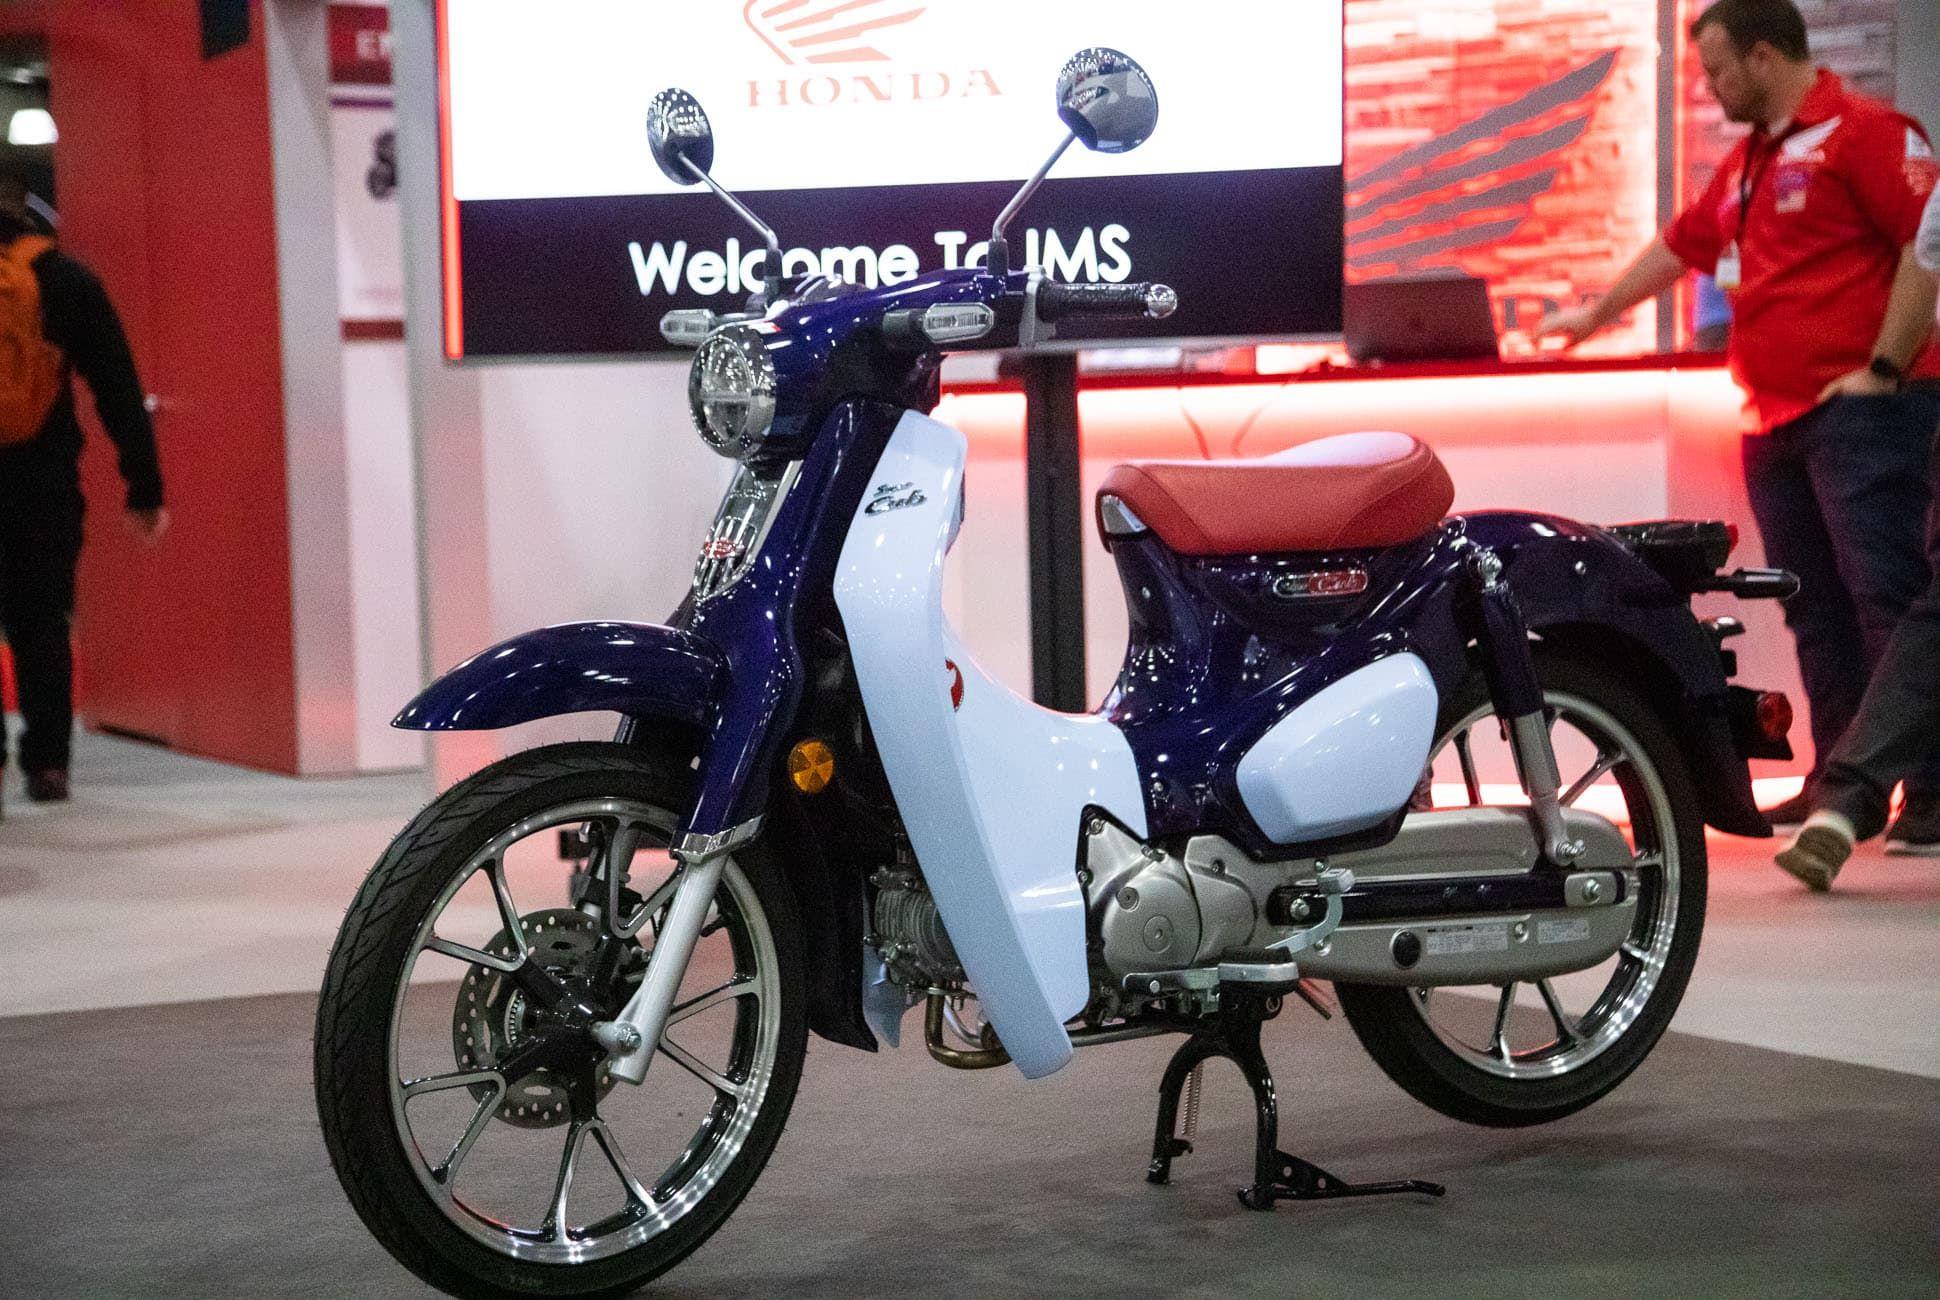 IMS 2018 Show Gear Patrol Honda Slide 01